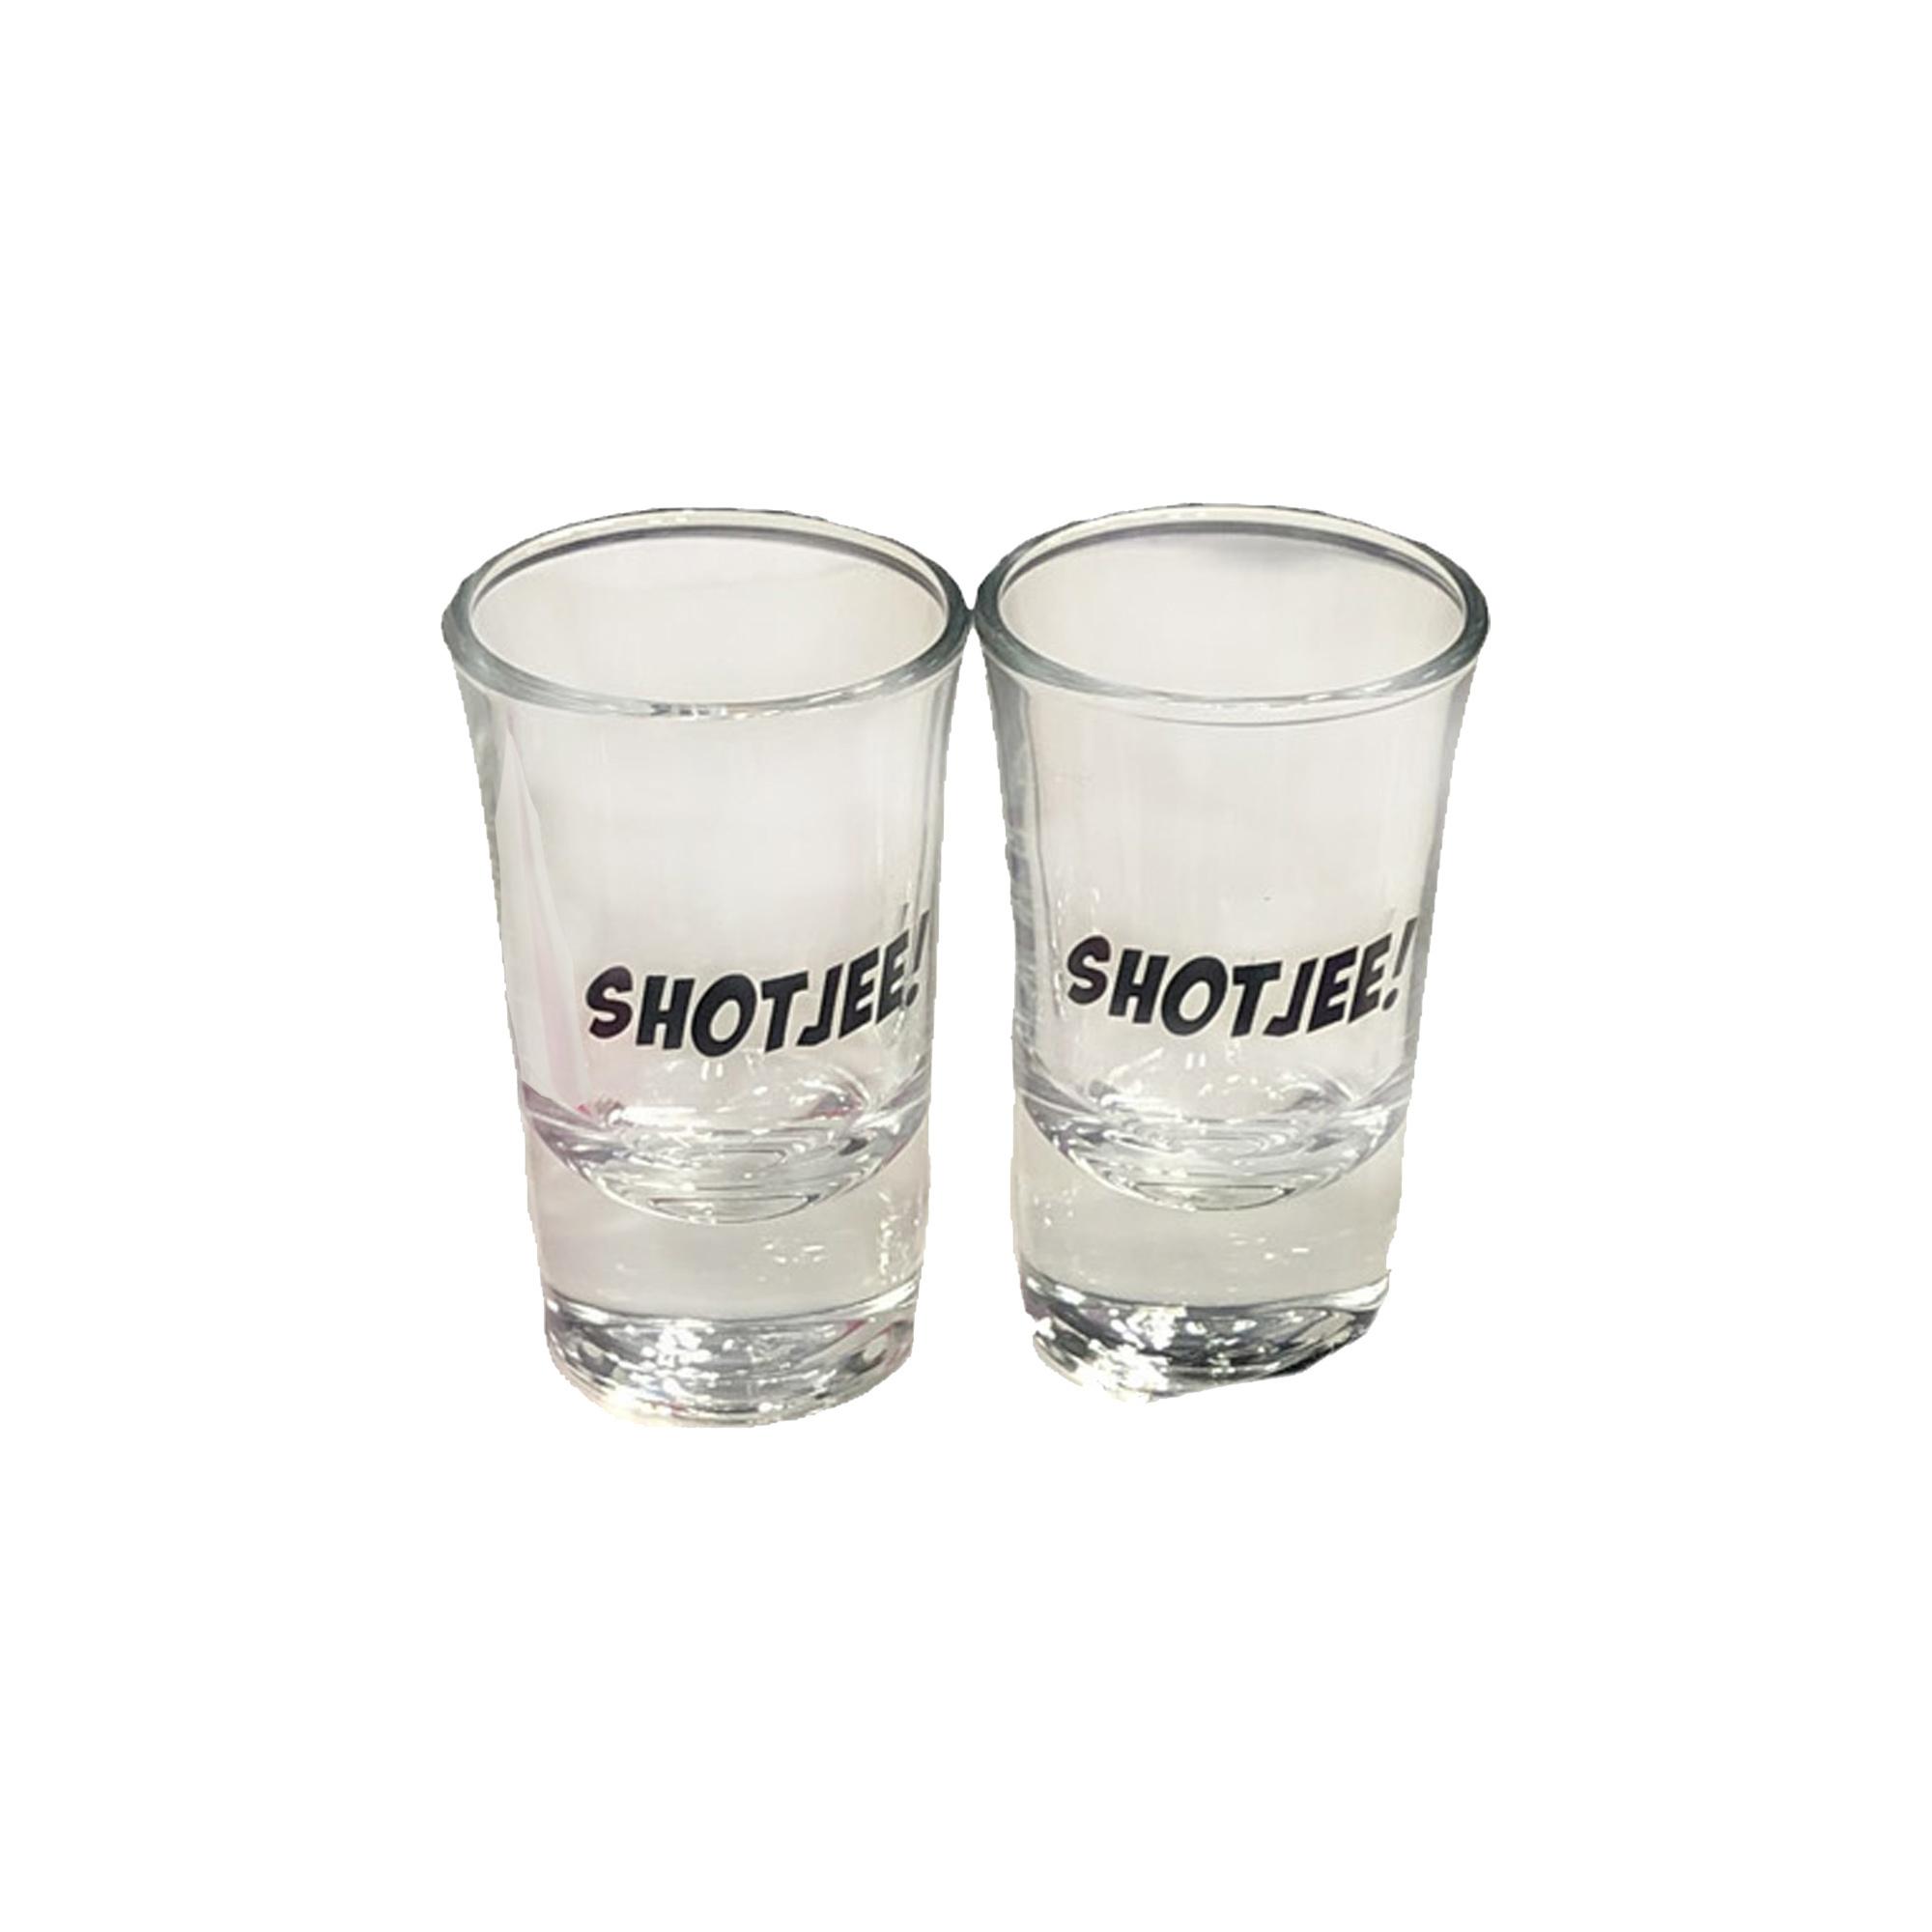 Shotjee Shotglasses